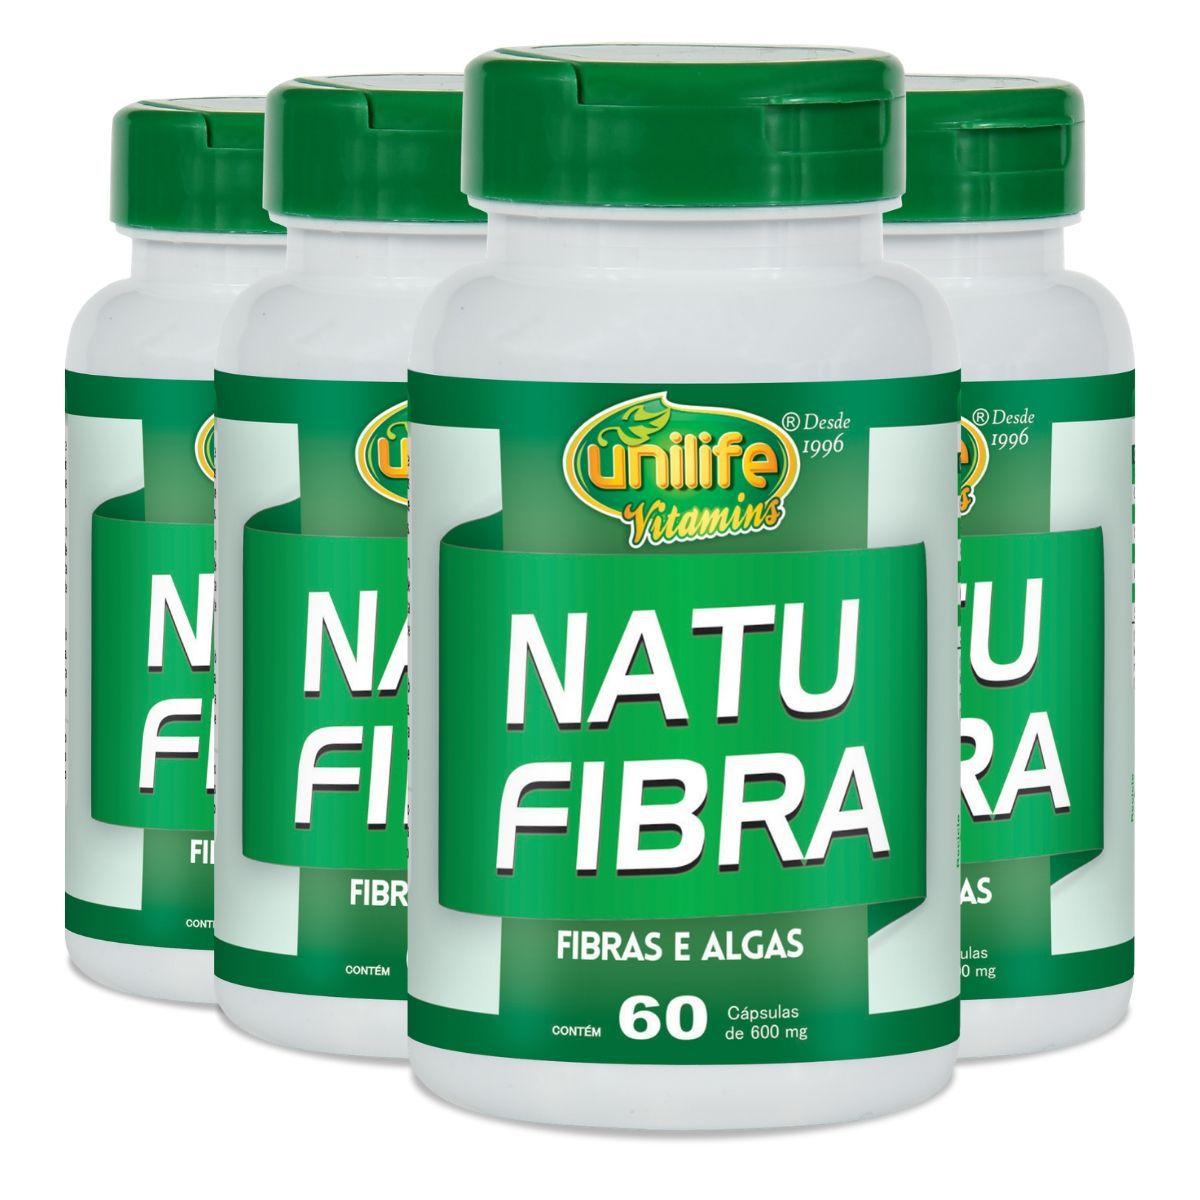 Kit 4 Natu Fibra Unilife Fibras e Algas - 600 Mg 60 cápsulas